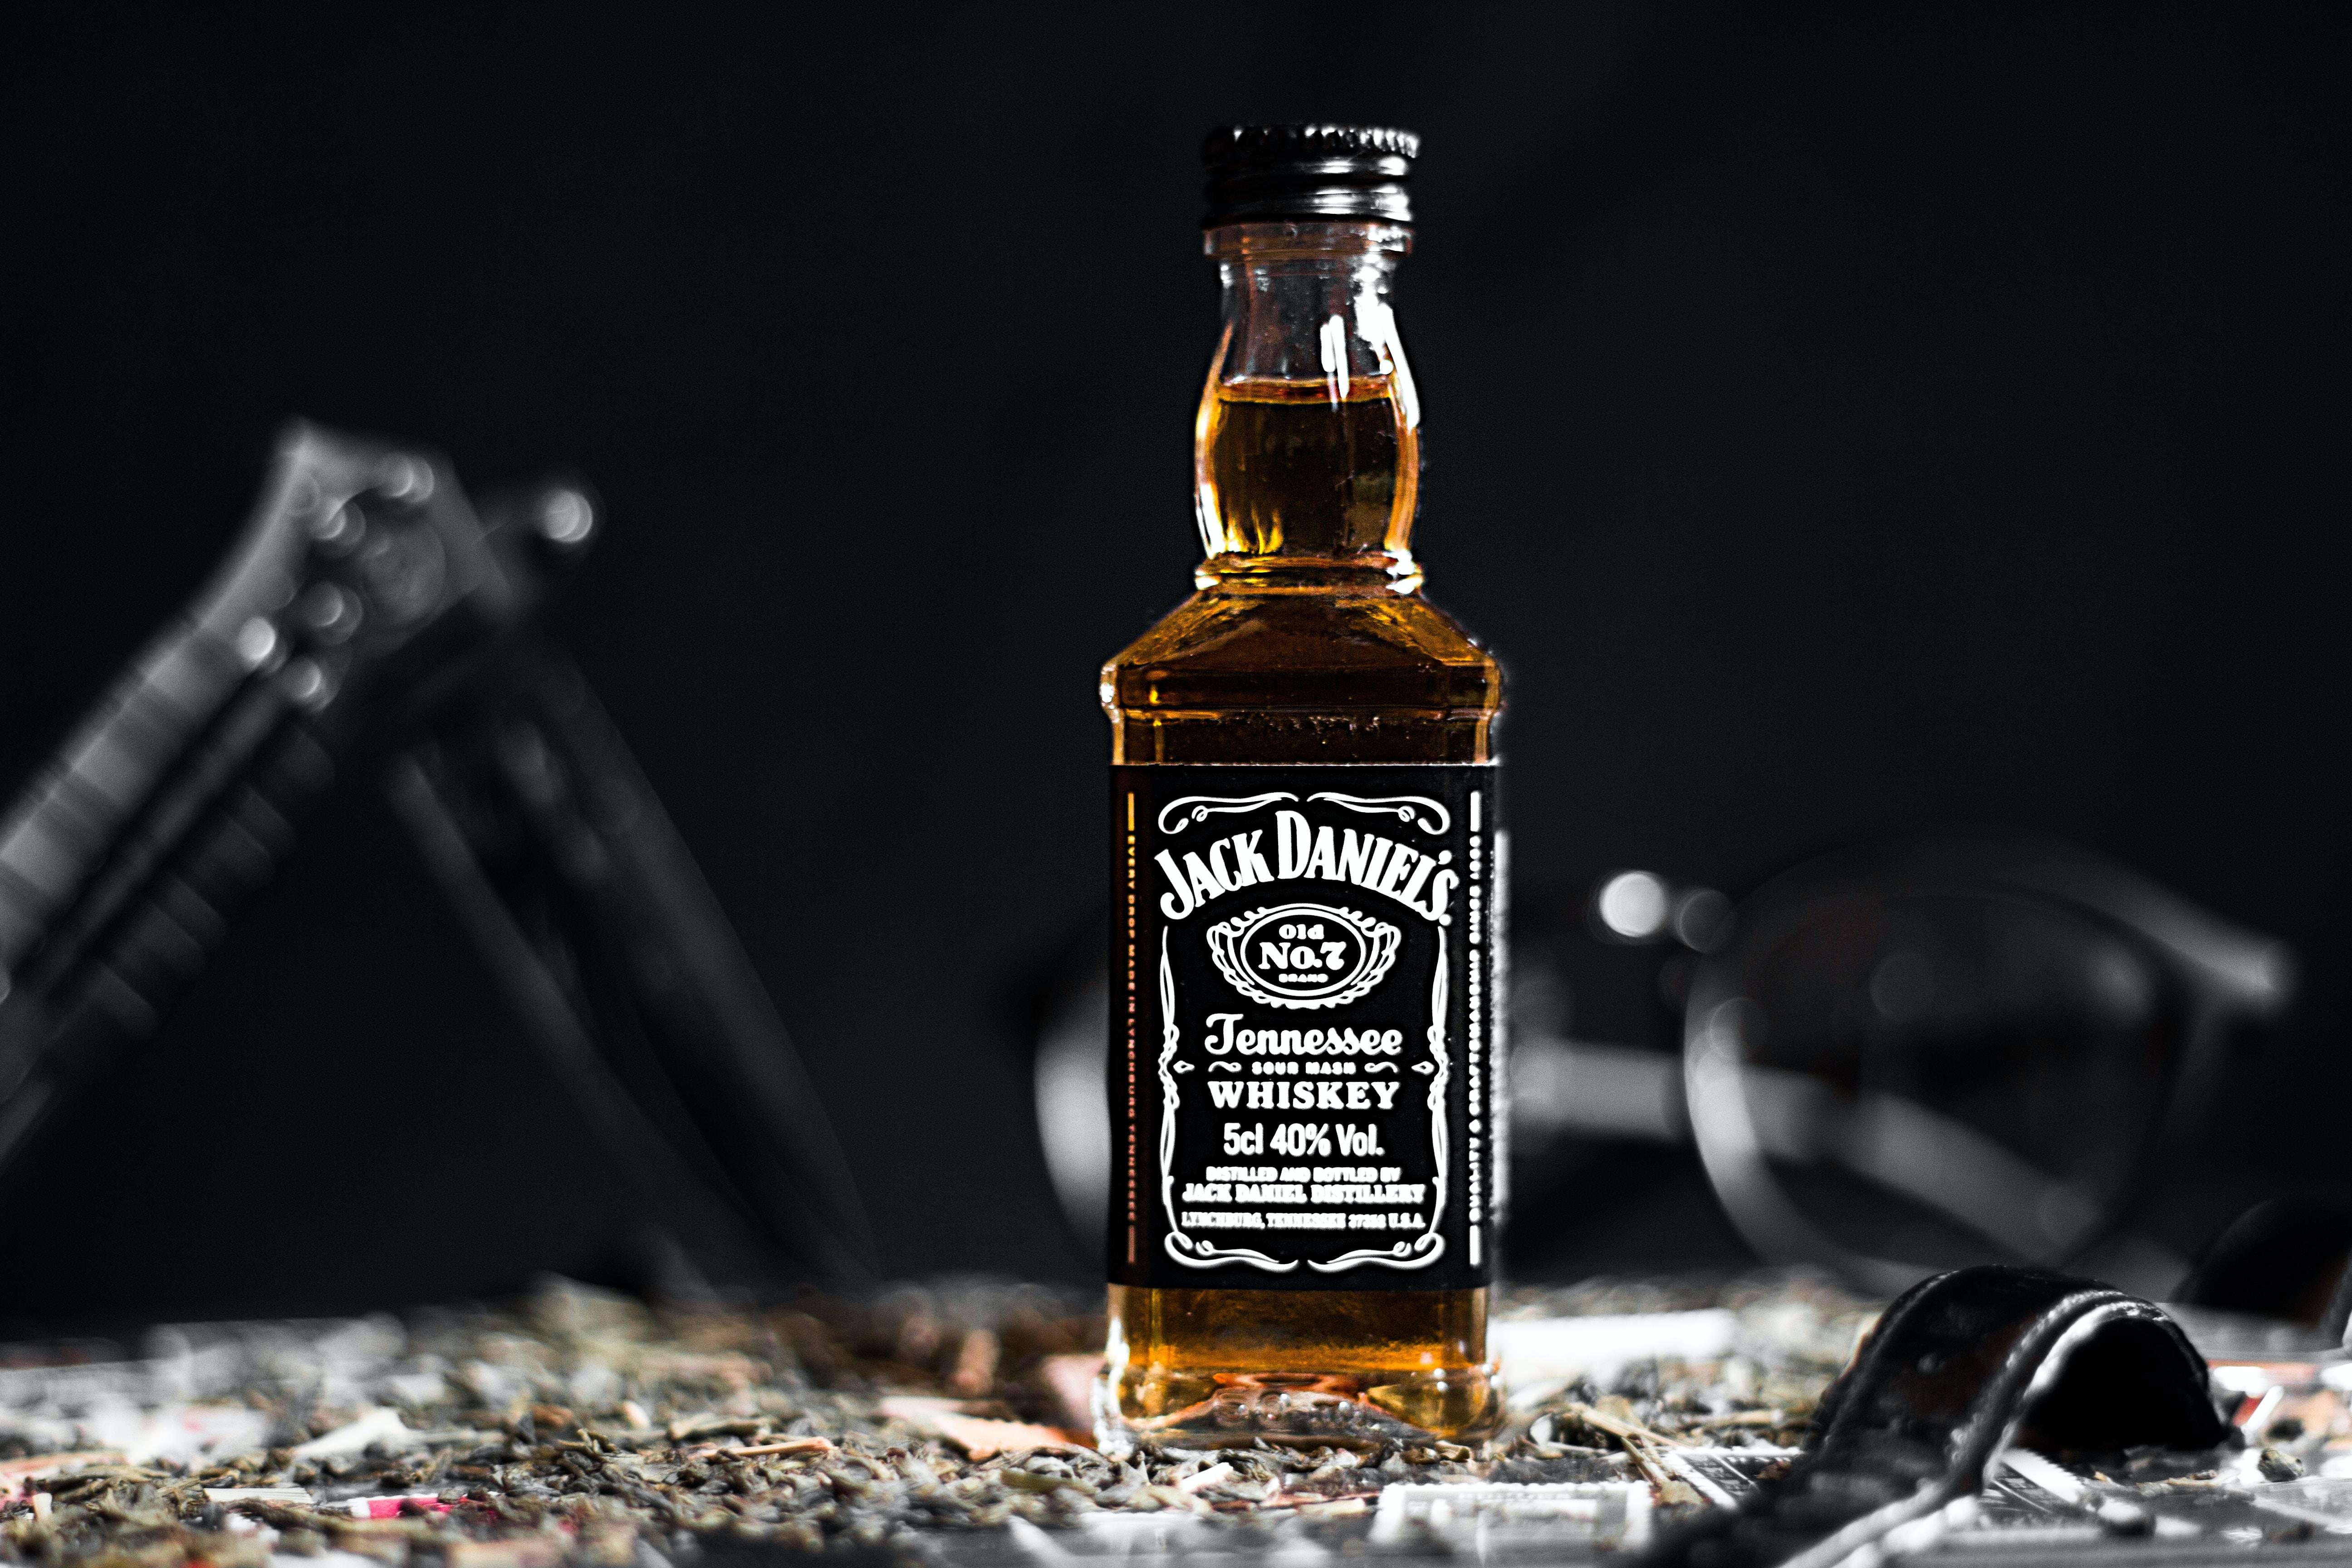 Jack Daniels Tennessee Whiskey bottle